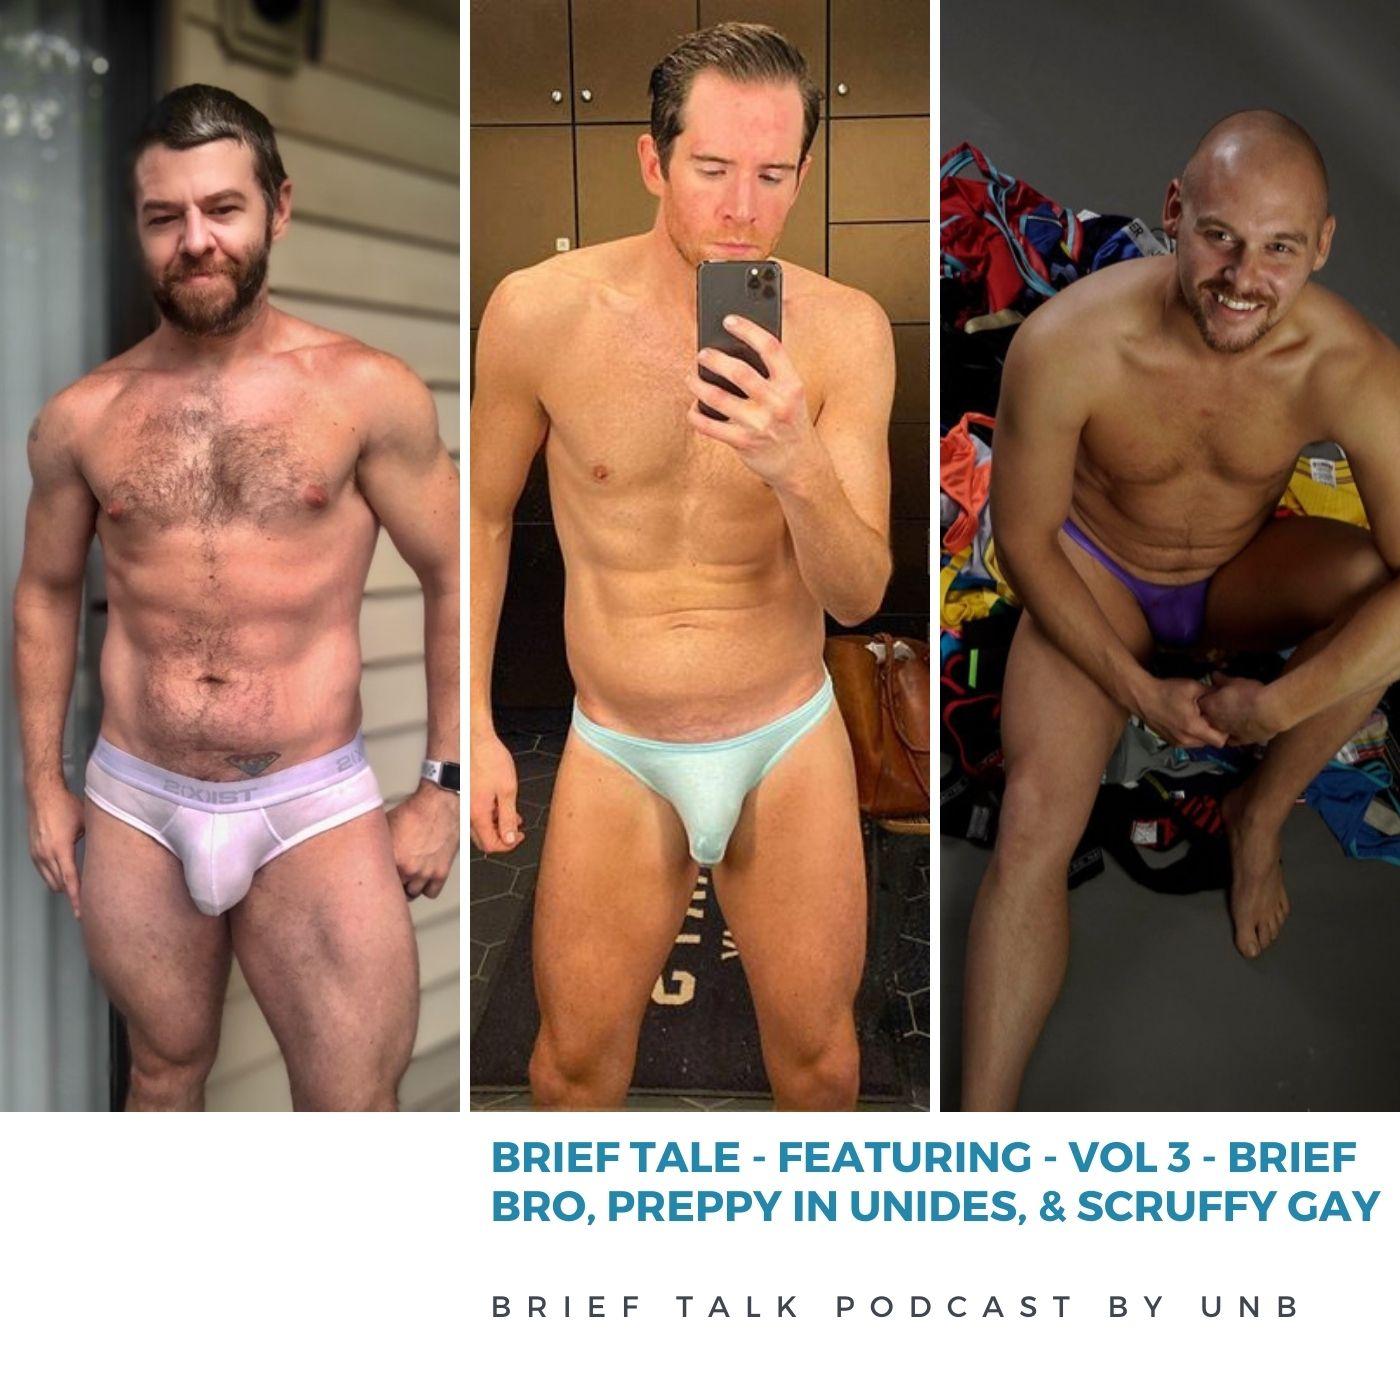 BRIEF TALE by Brief Talk: Volume 3 with BriefBro, PreppyInUndies & ScruffyGay